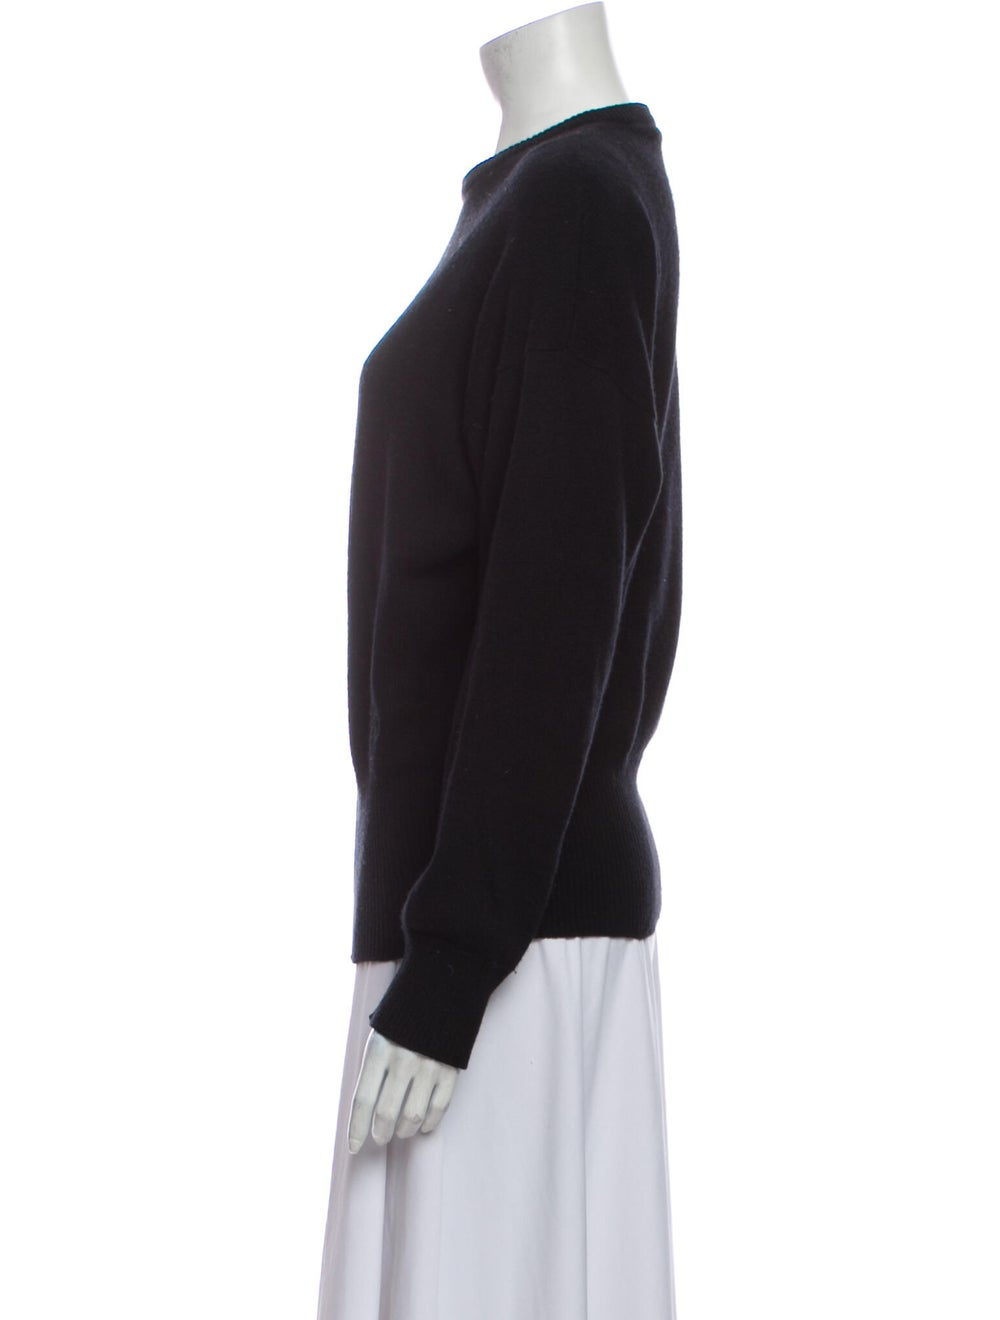 Gucci 1970's Cashmere Sweater Black - image 2